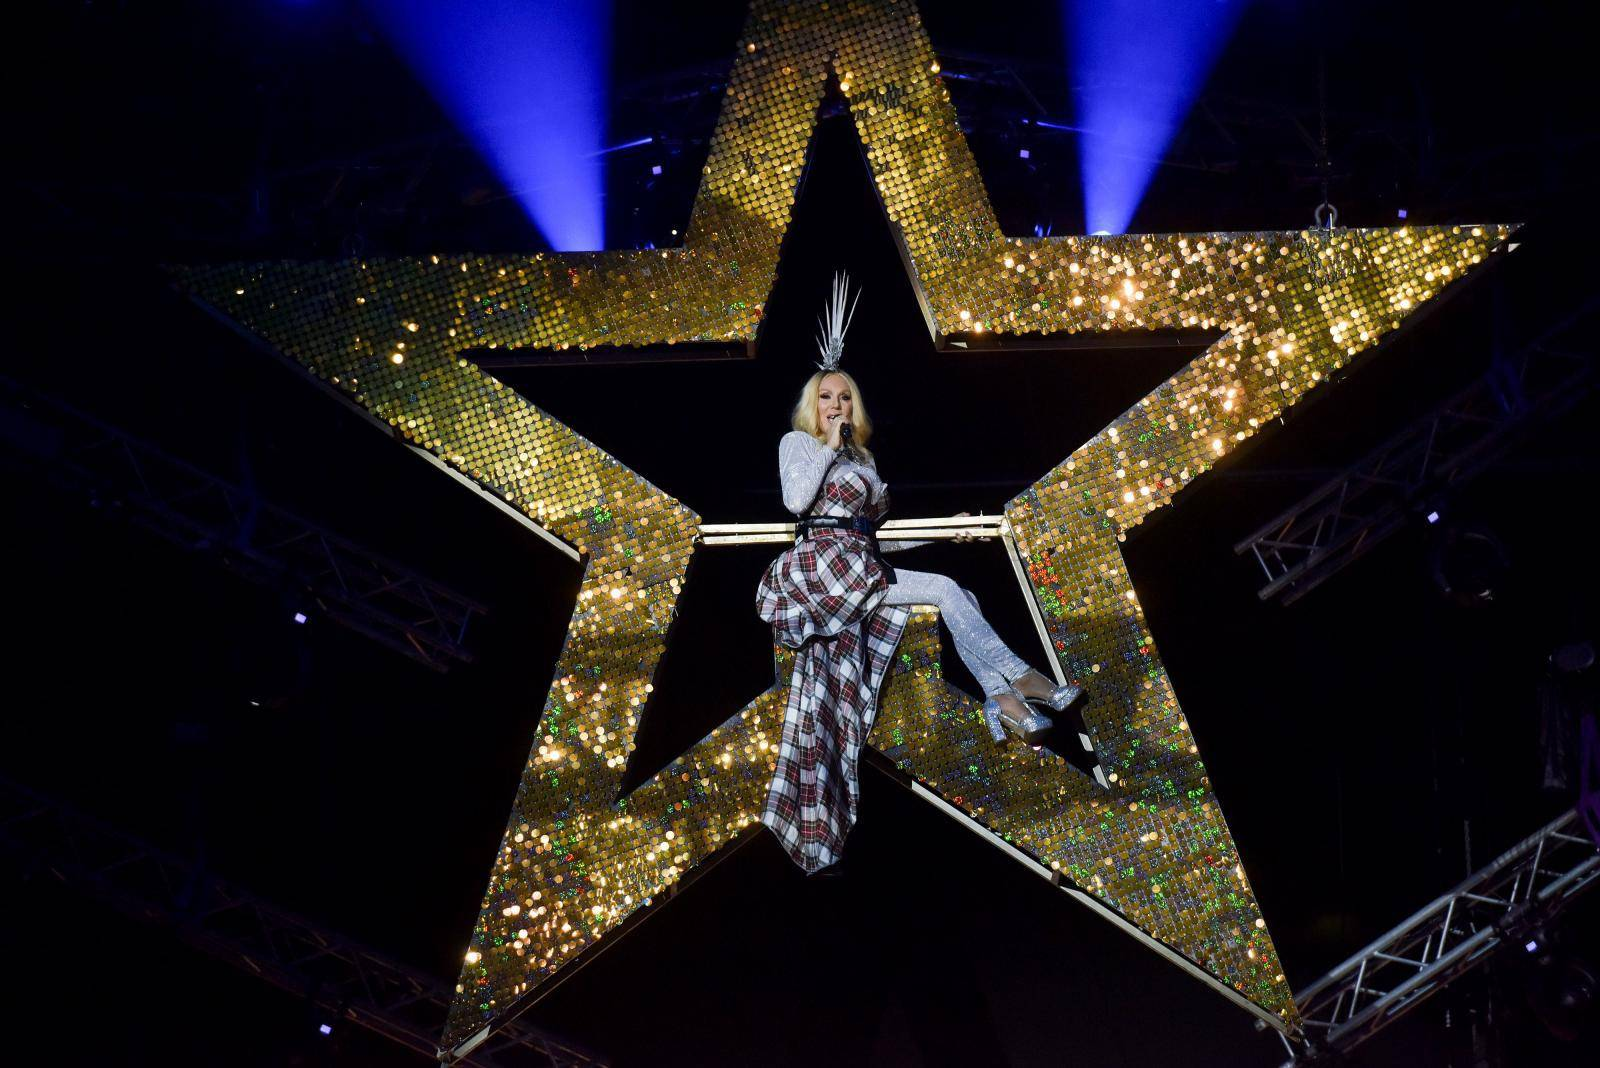 Zagreb: Lepa Brena održala koncert u zagrebačkoj Areni